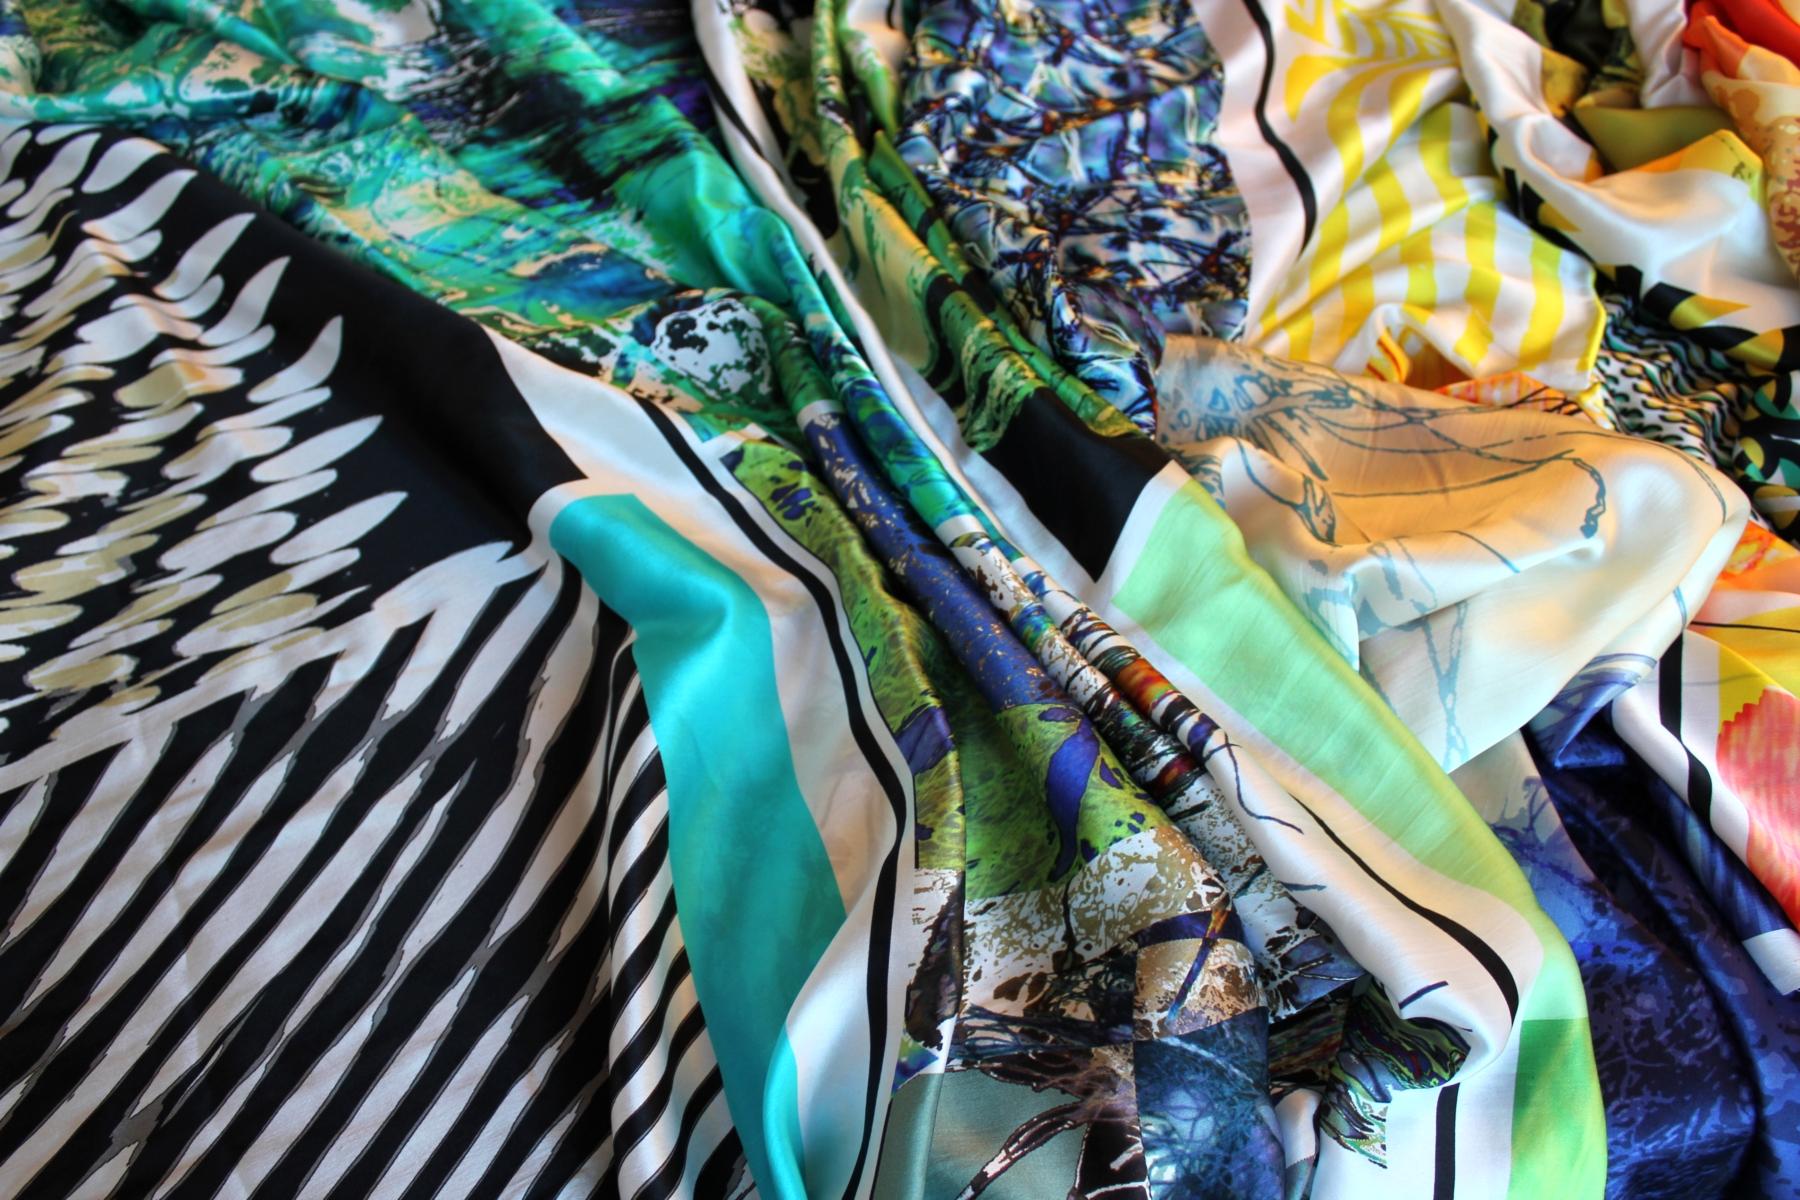 preview on textile design trends for fashion 2013 roberto alborghetti. Black Bedroom Furniture Sets. Home Design Ideas